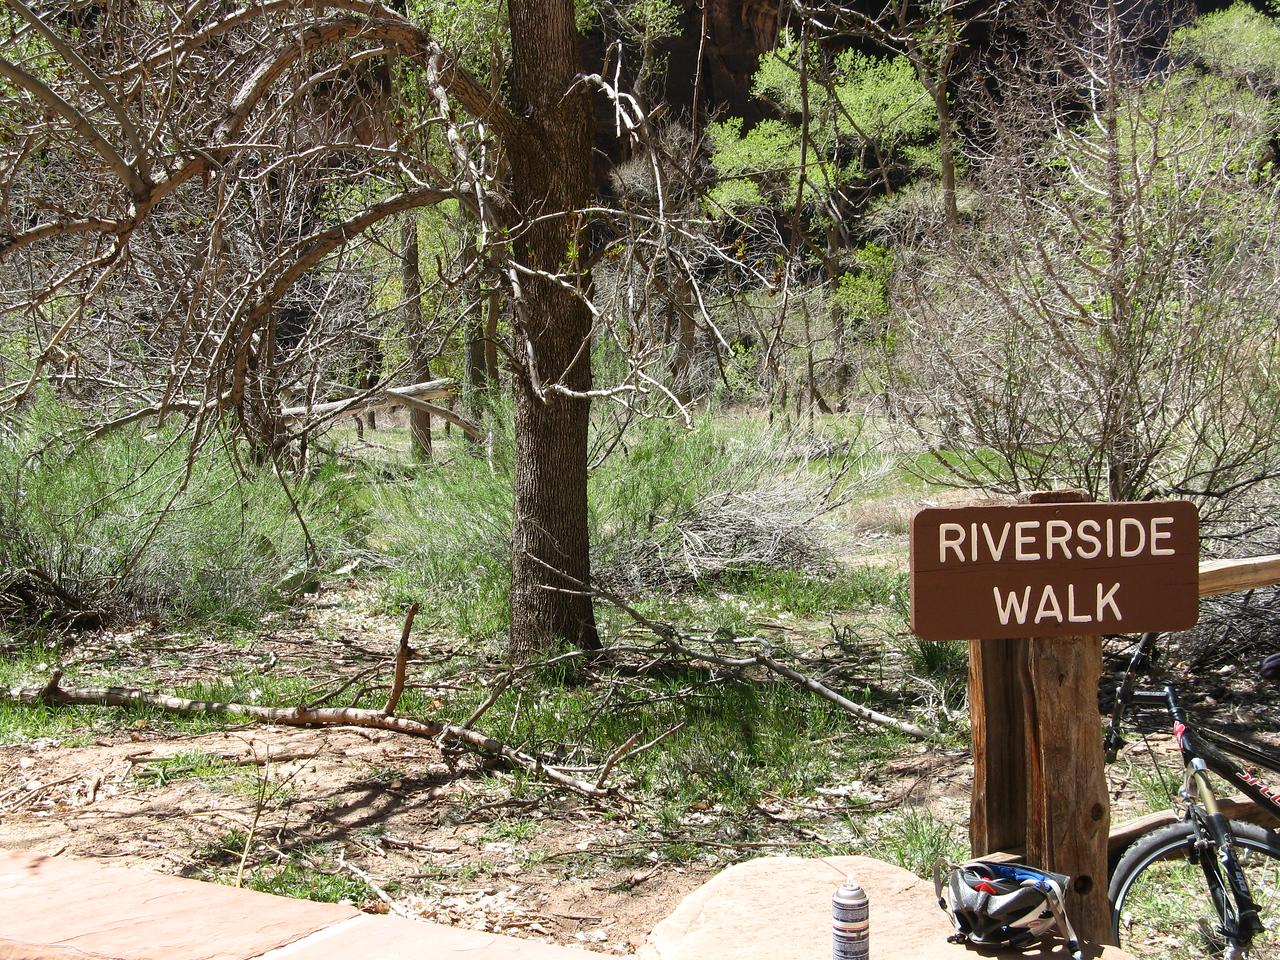 2011-04-19 Riverside 013